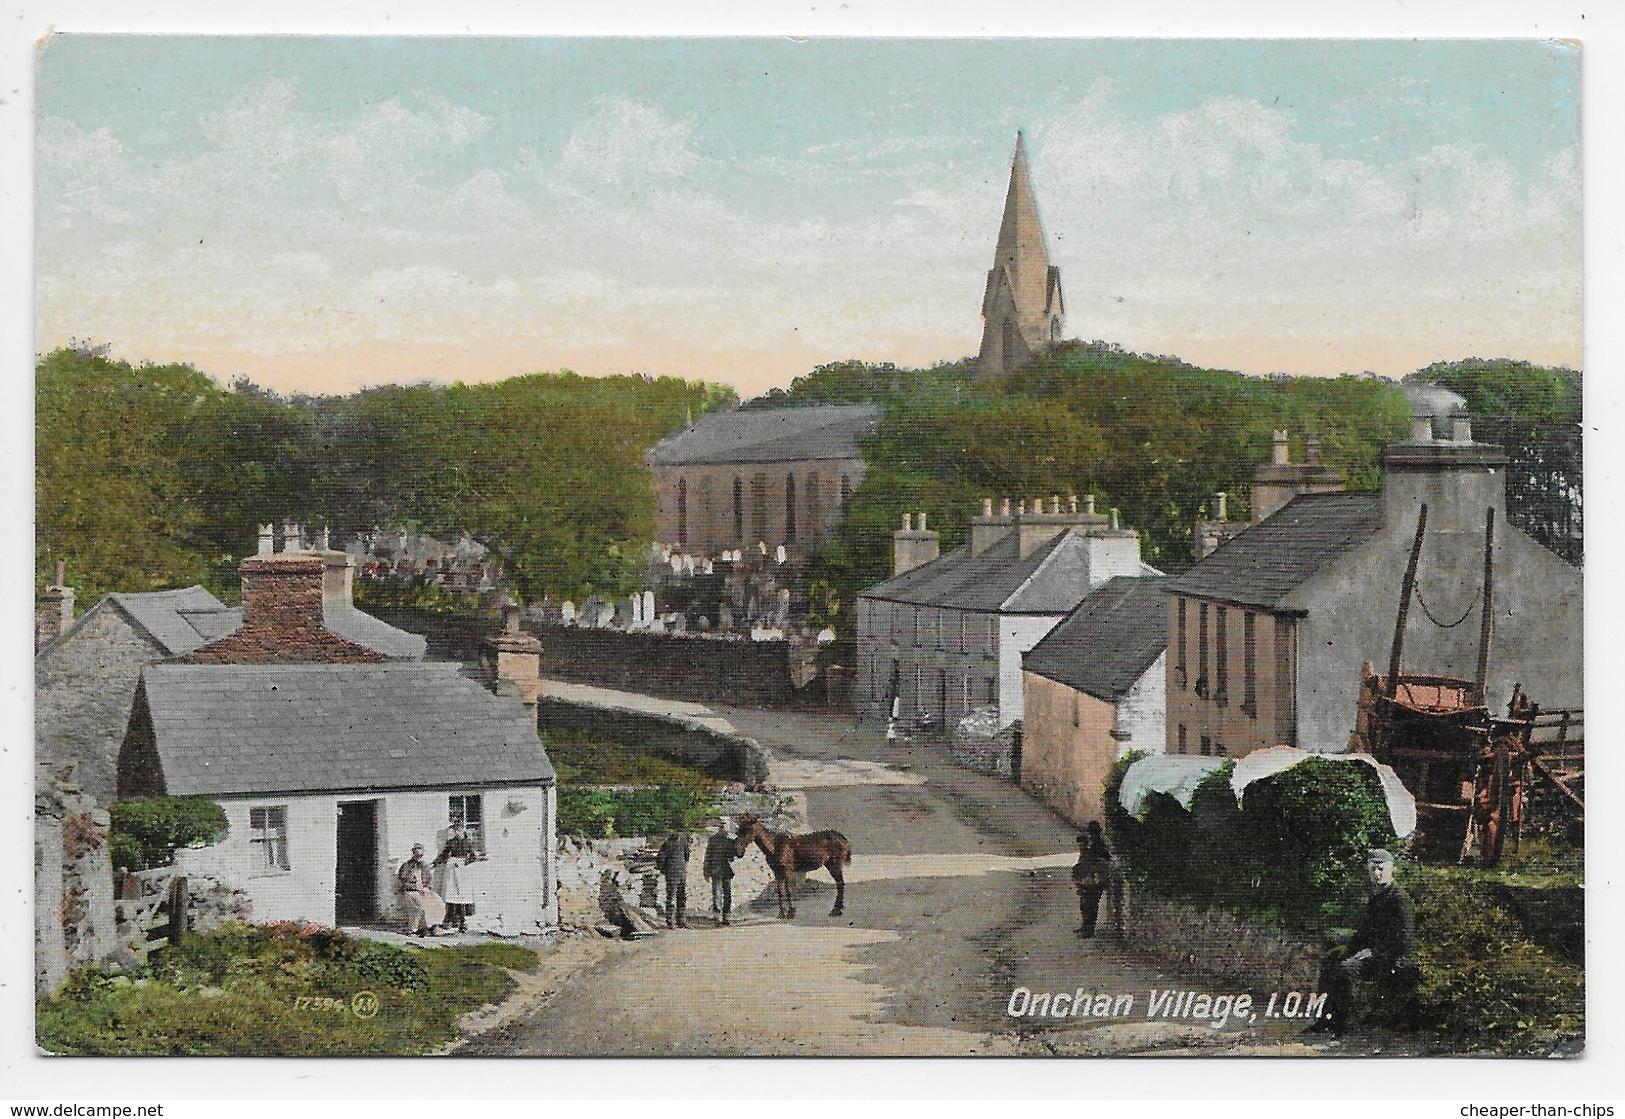 Onchan Village, I.O.M. - Valentine Souvenir 17594 - Isle Of Man